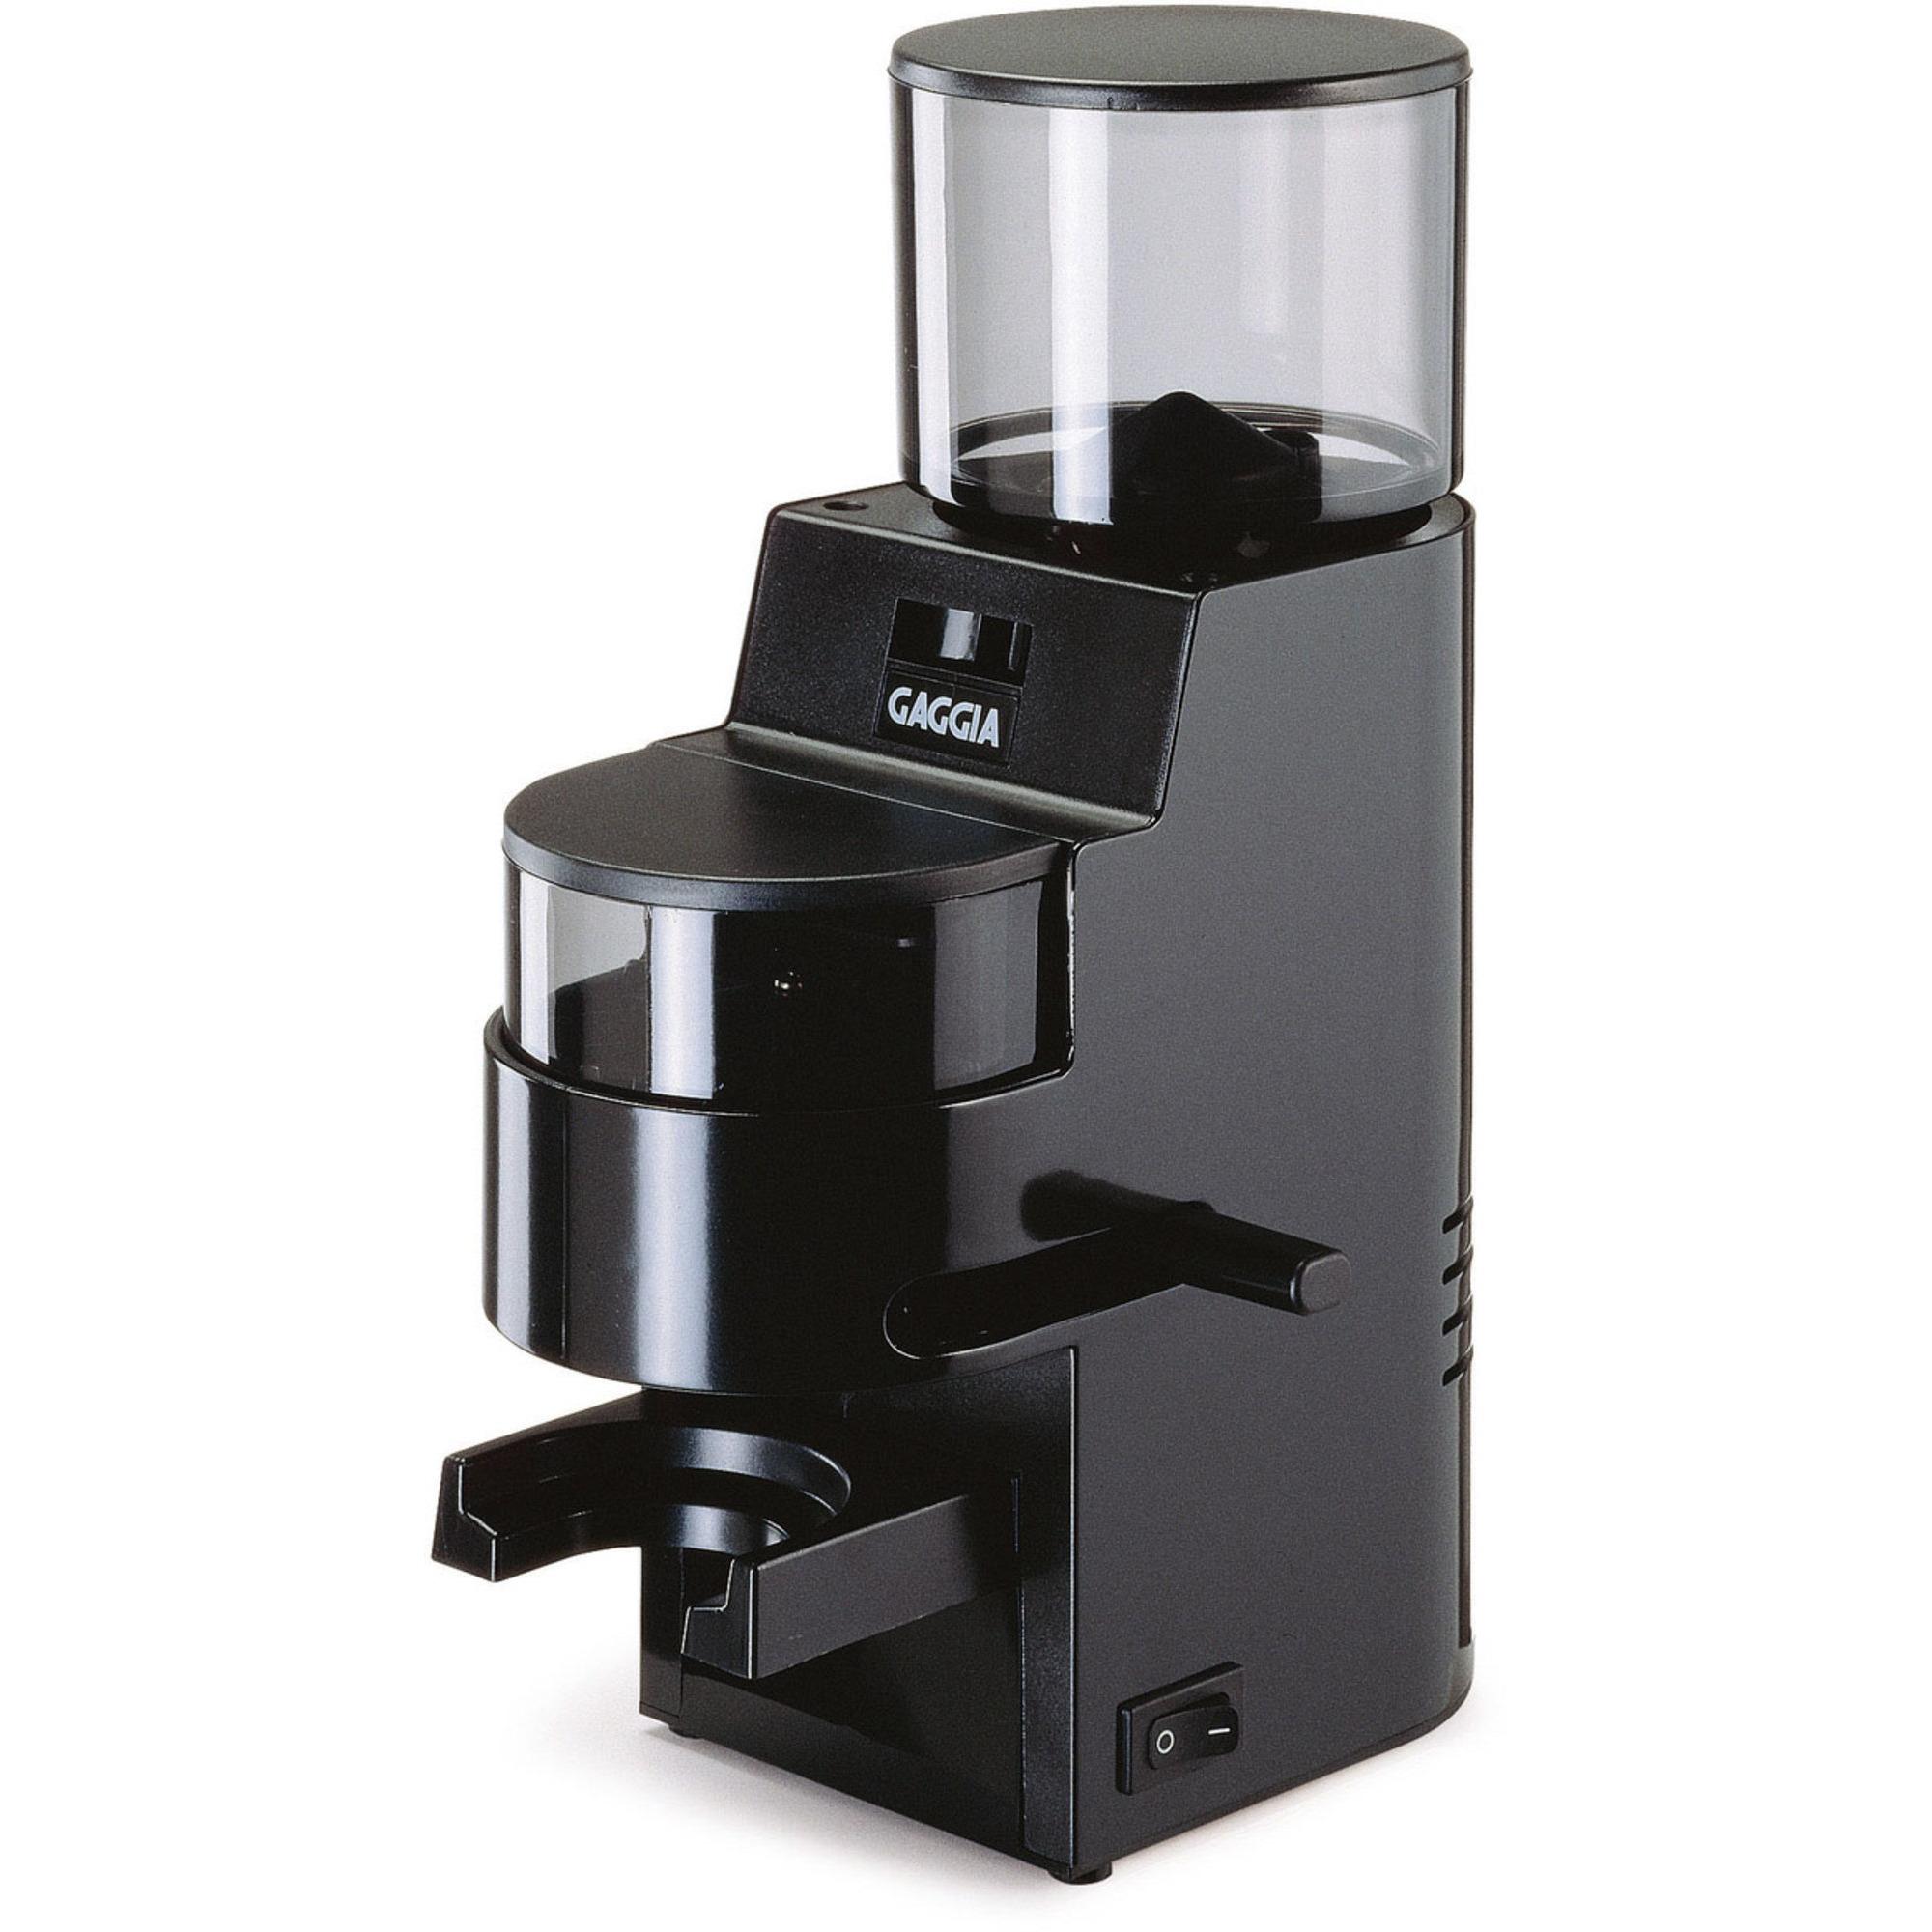 Gaggia MDF Kaffekvarn